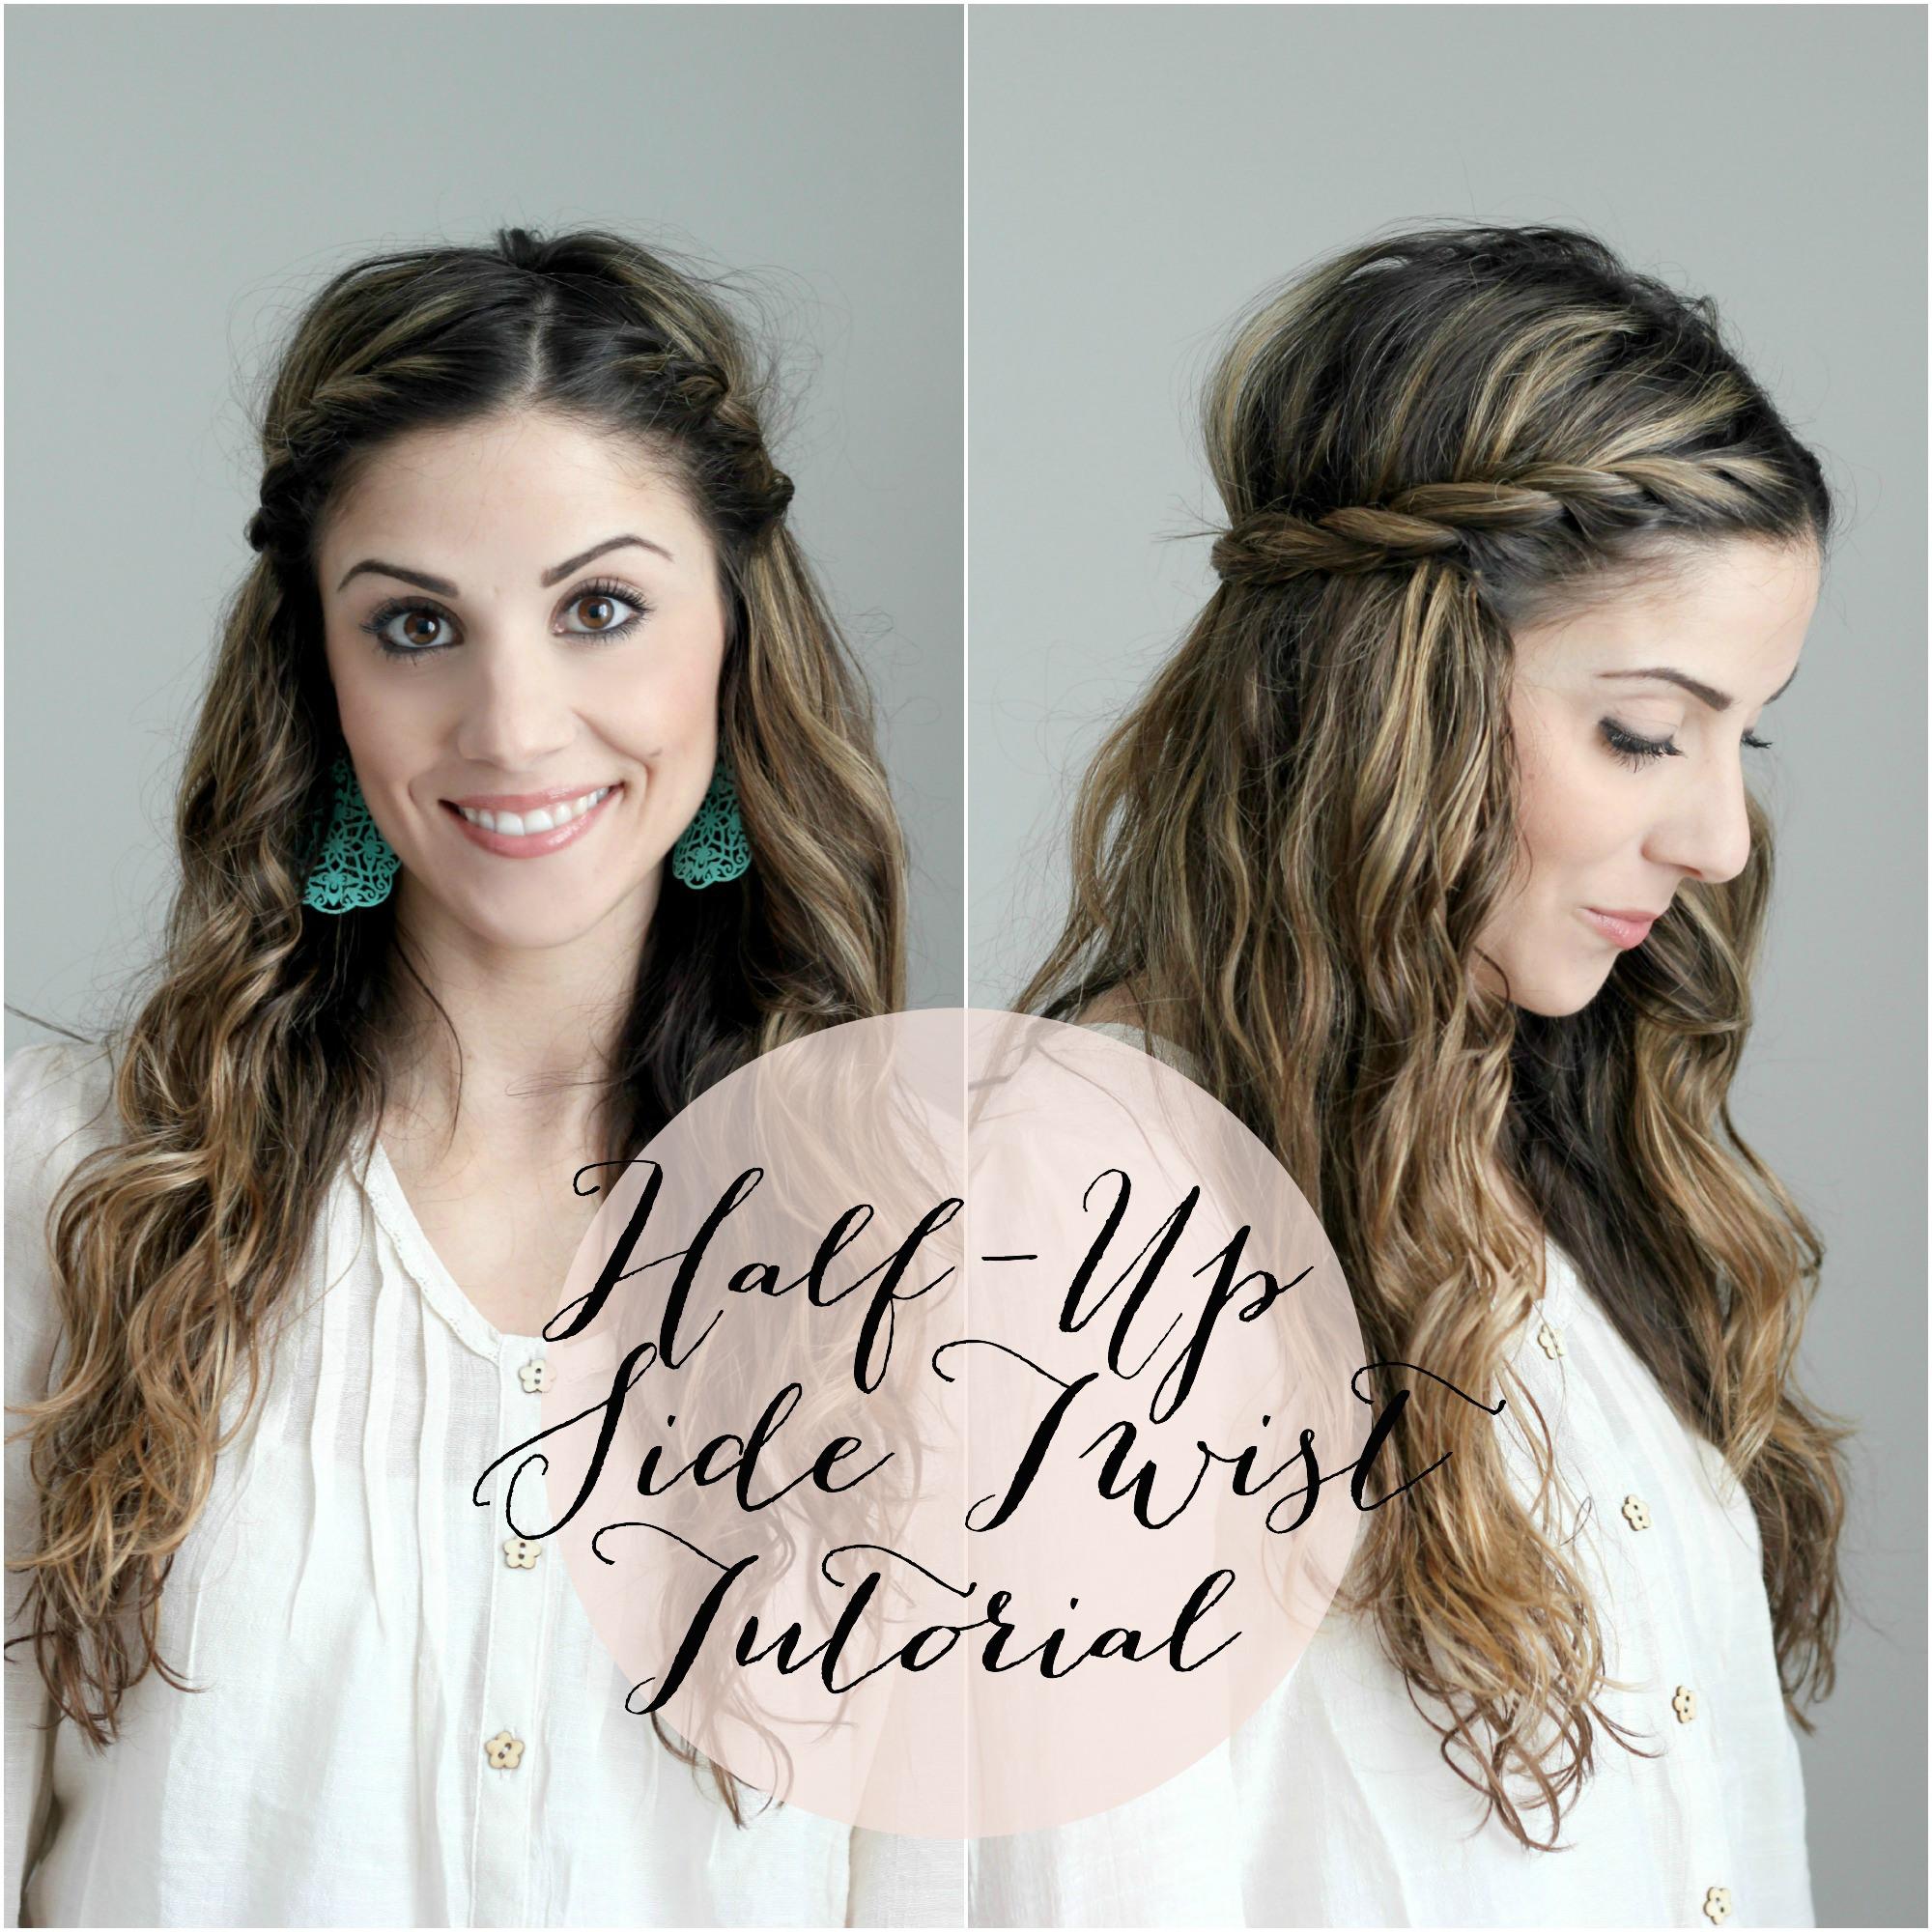 Half up side twist hair